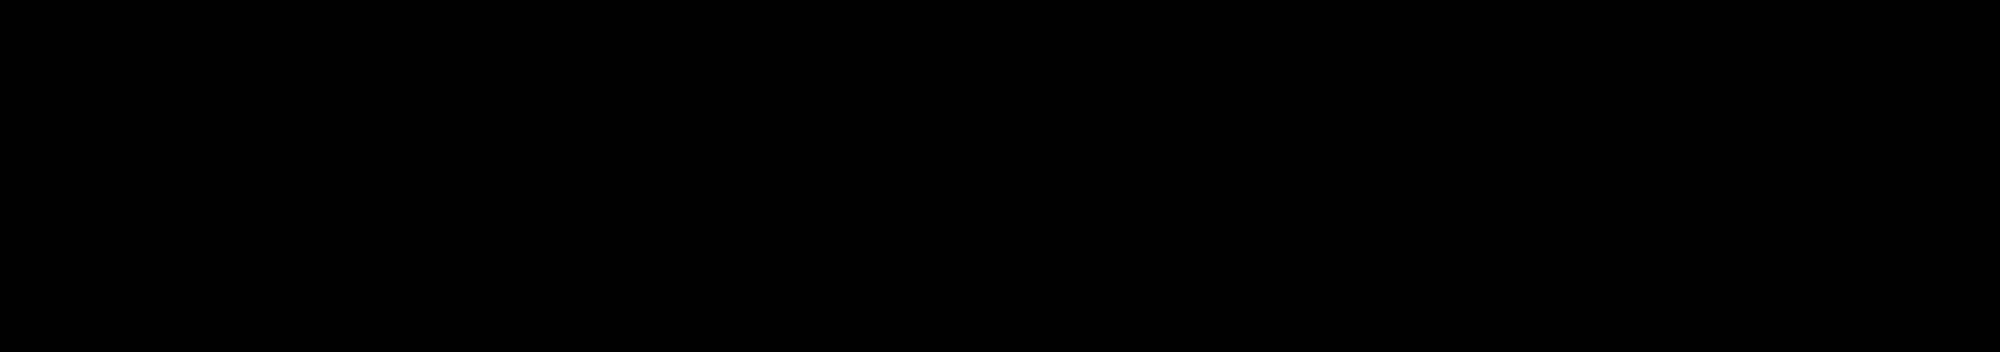 Omnicom Group Logo Vector PNG - 32608